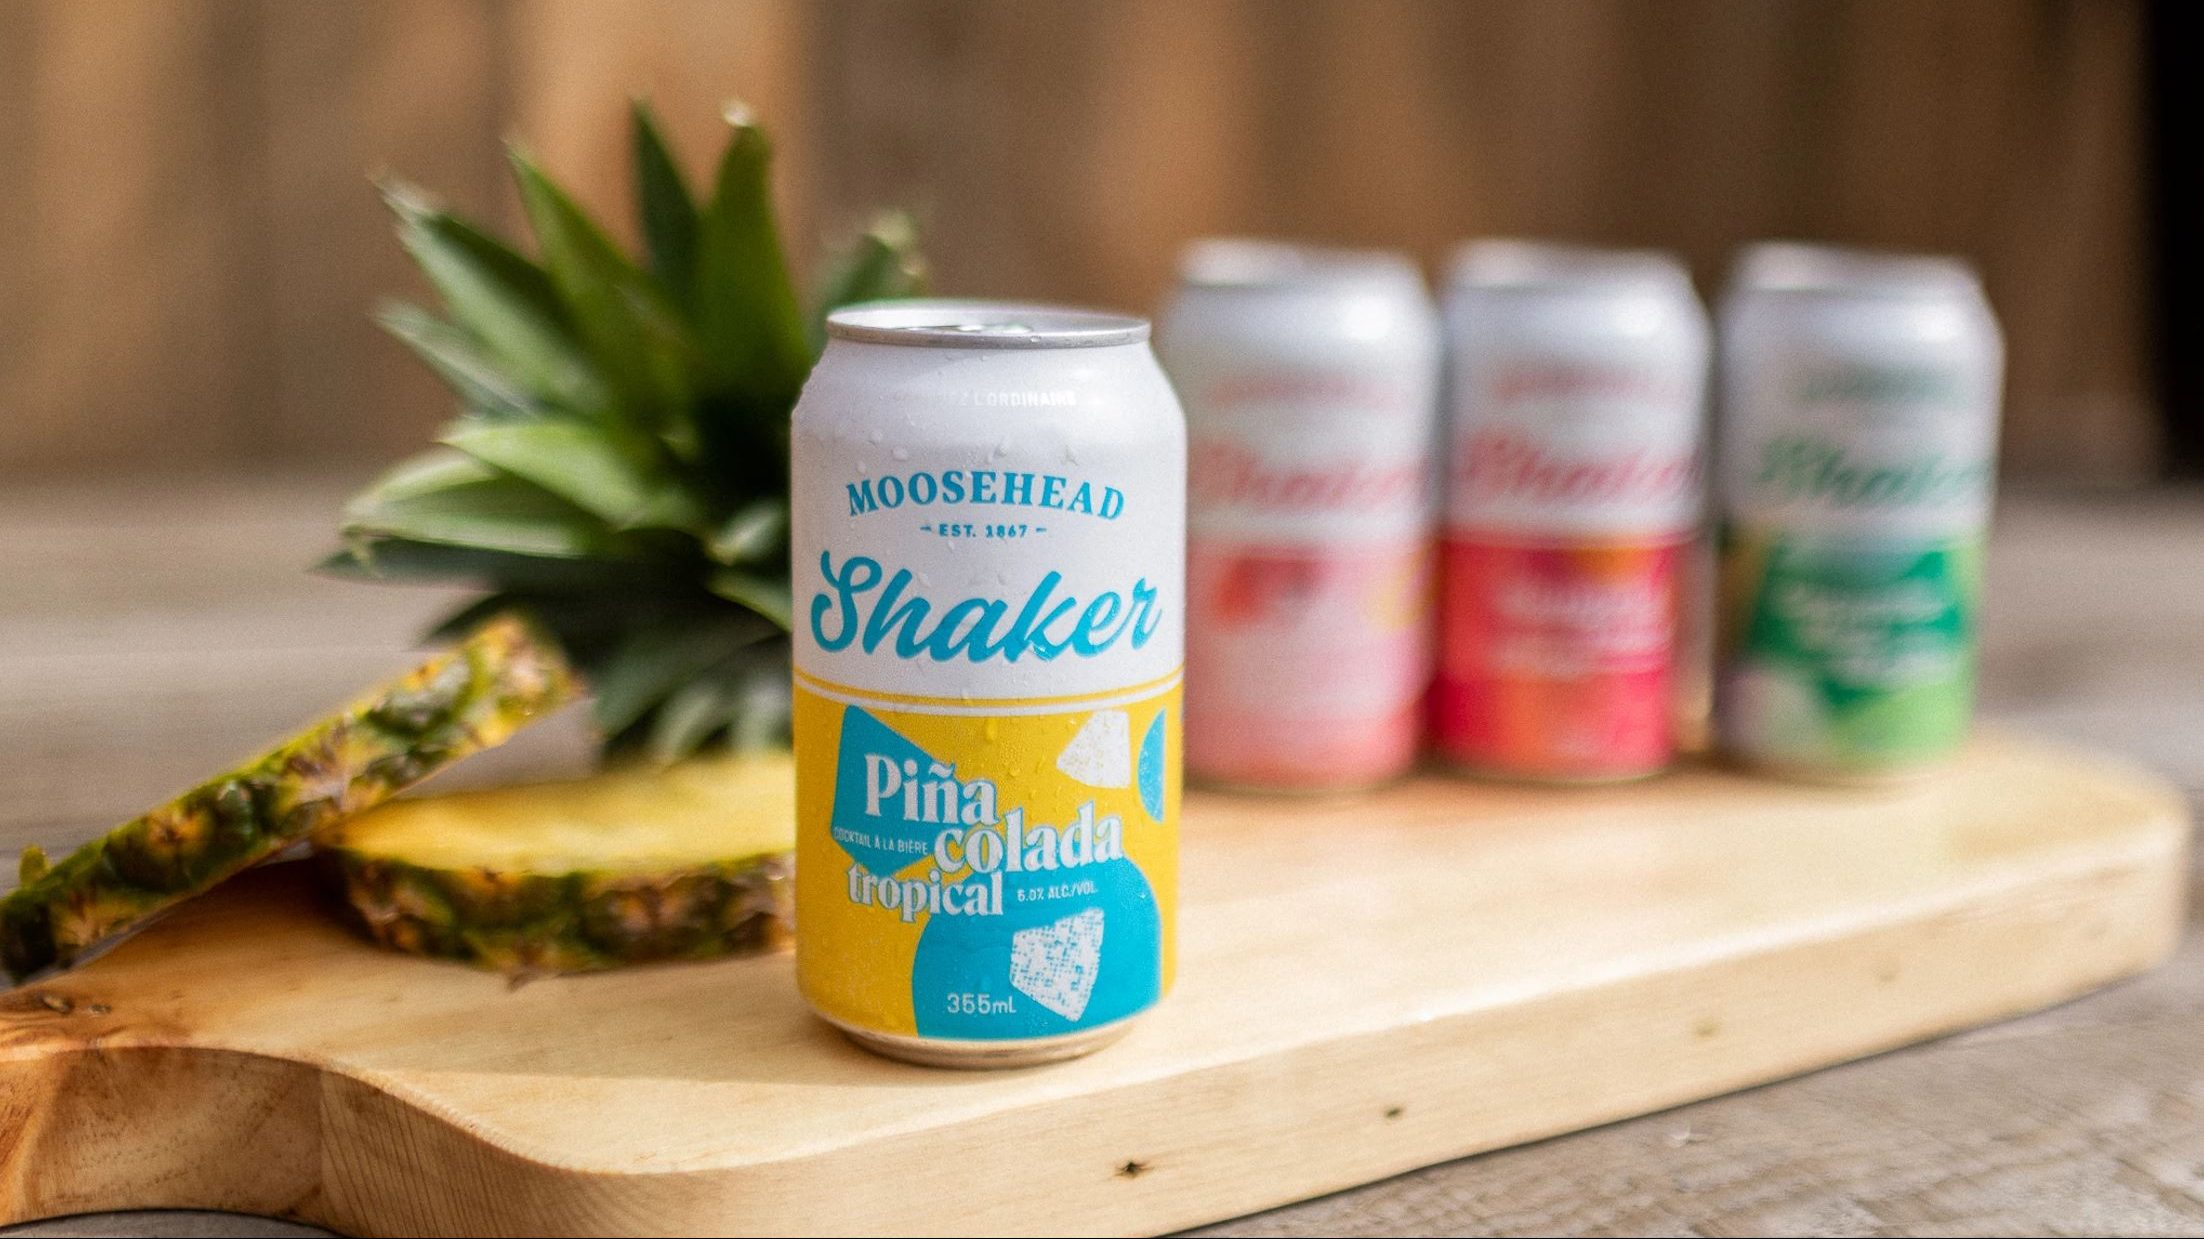 Moosehead Tropical Piña Colada Shaker Named Best Experimental Beer At Canadian Brewing Awards photo